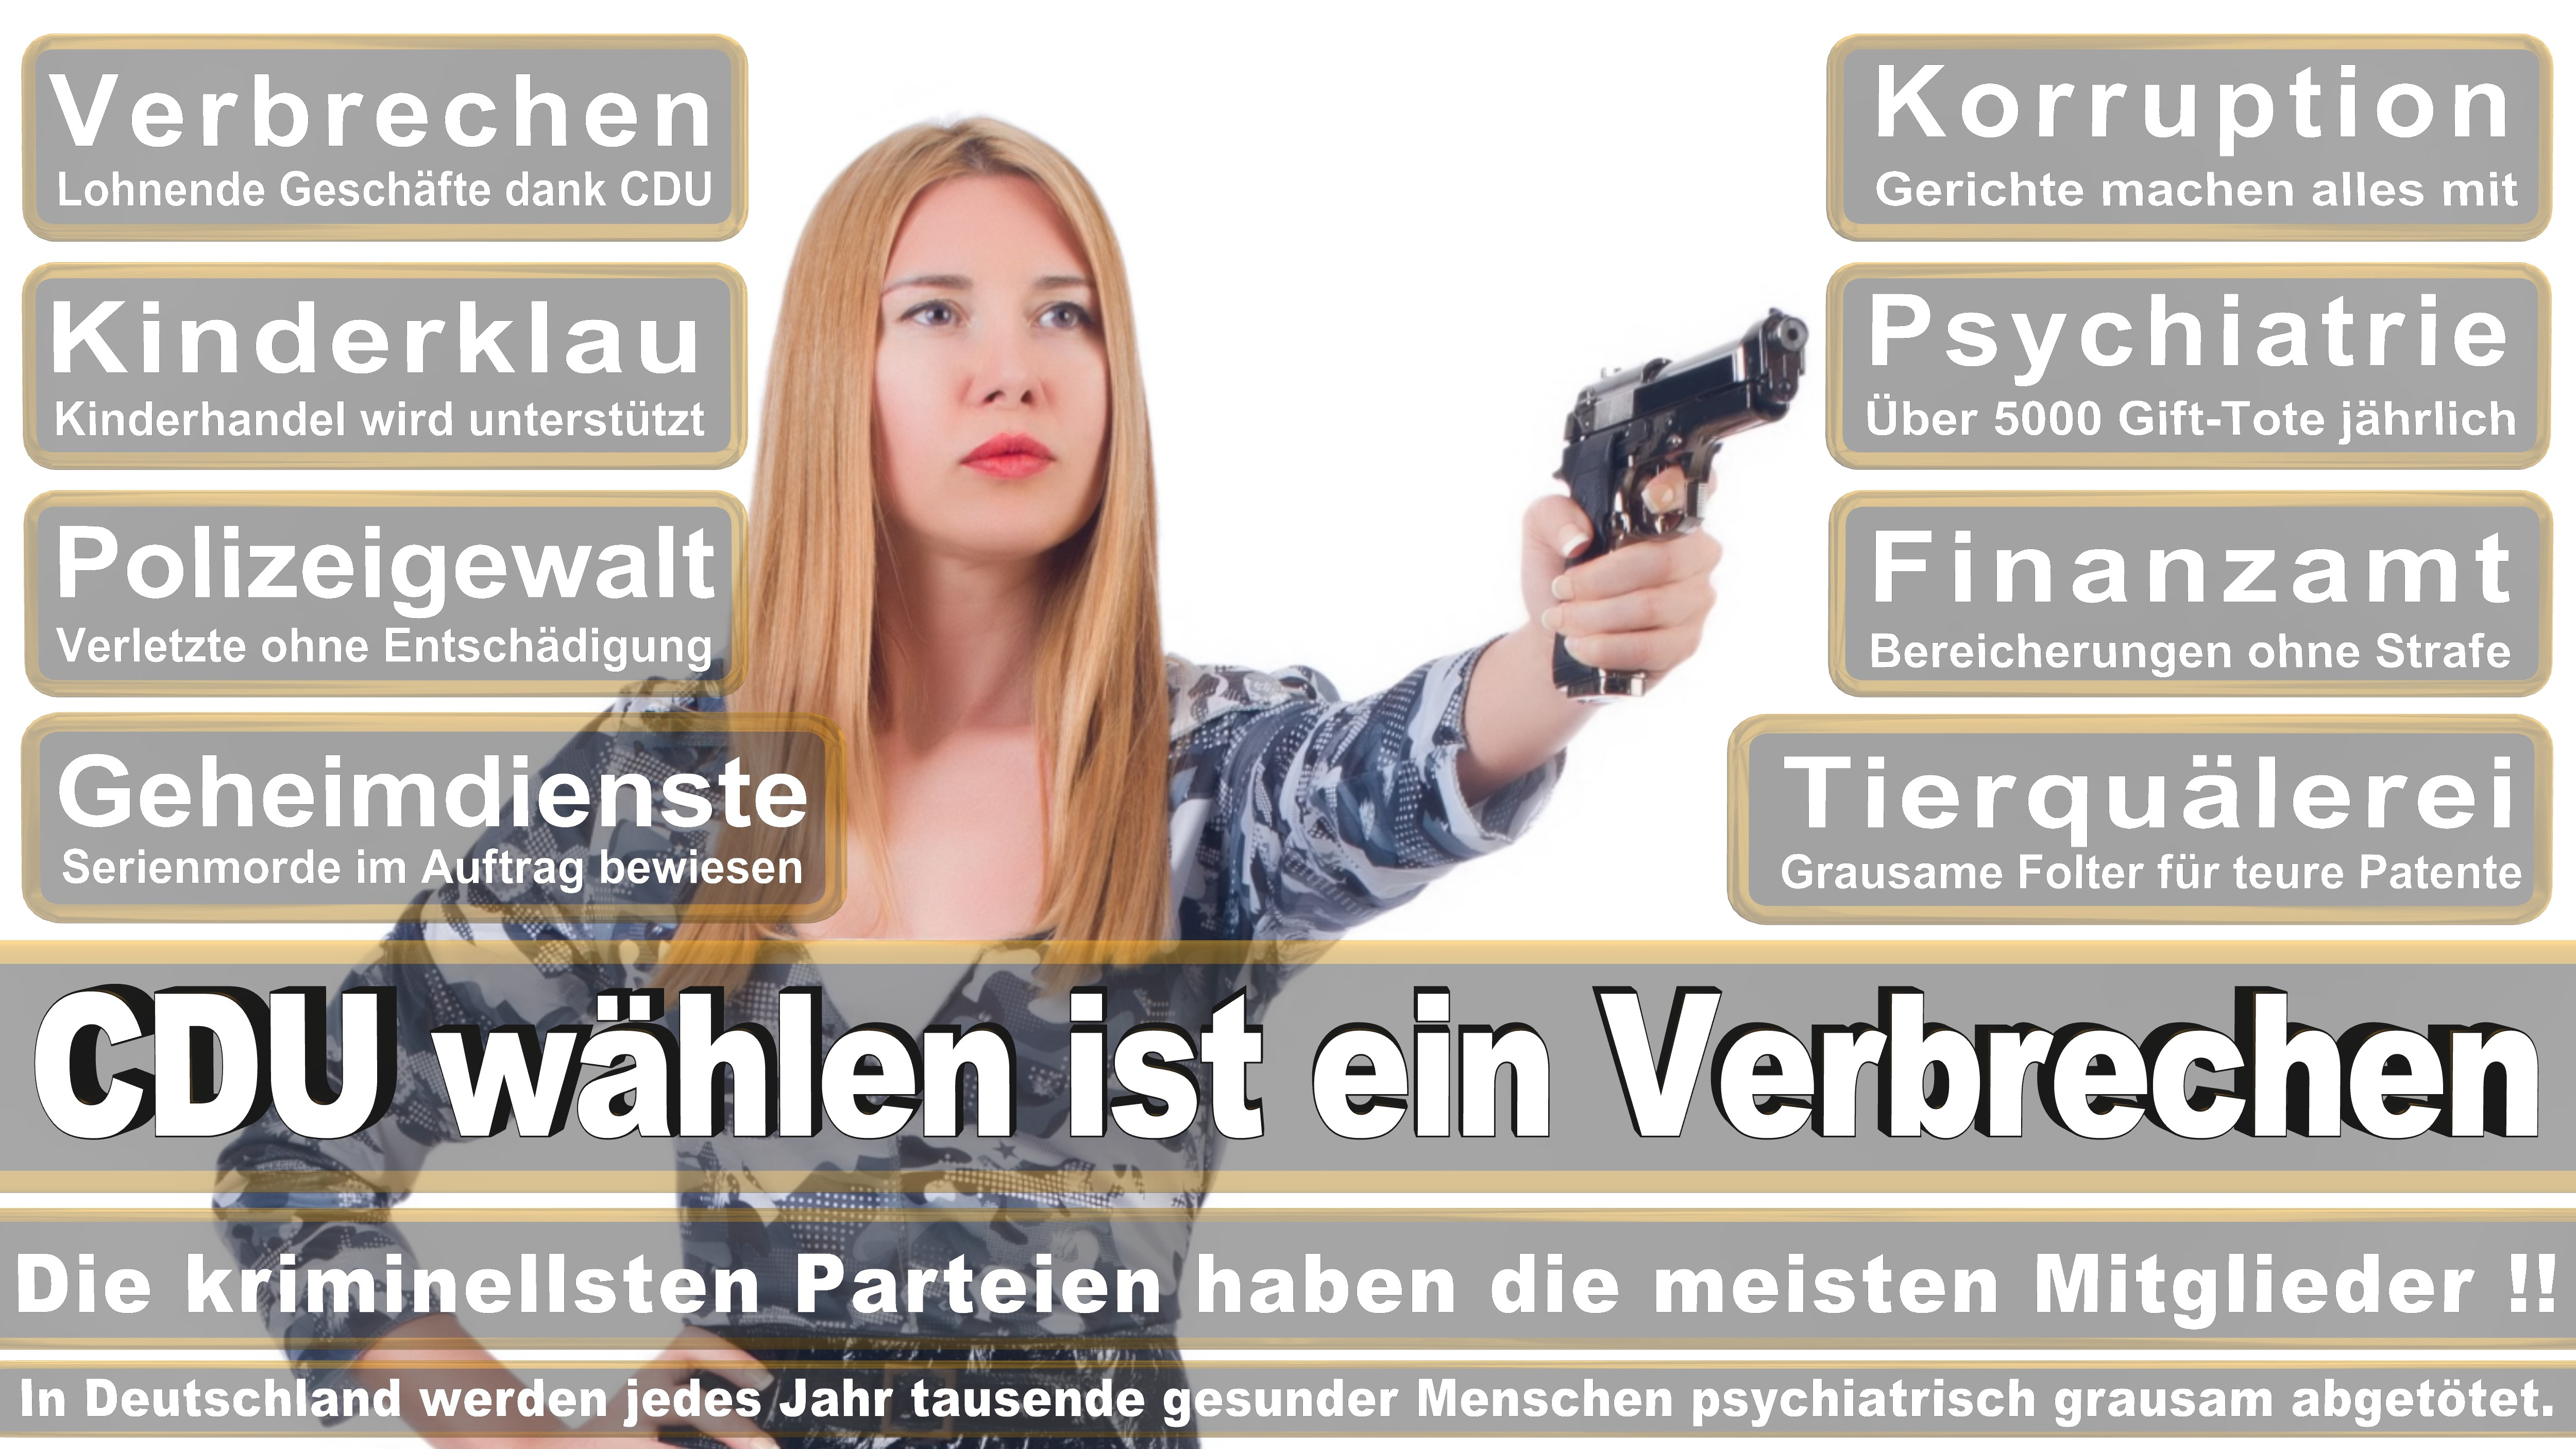 Michael Frieser CDU CSU Politiker